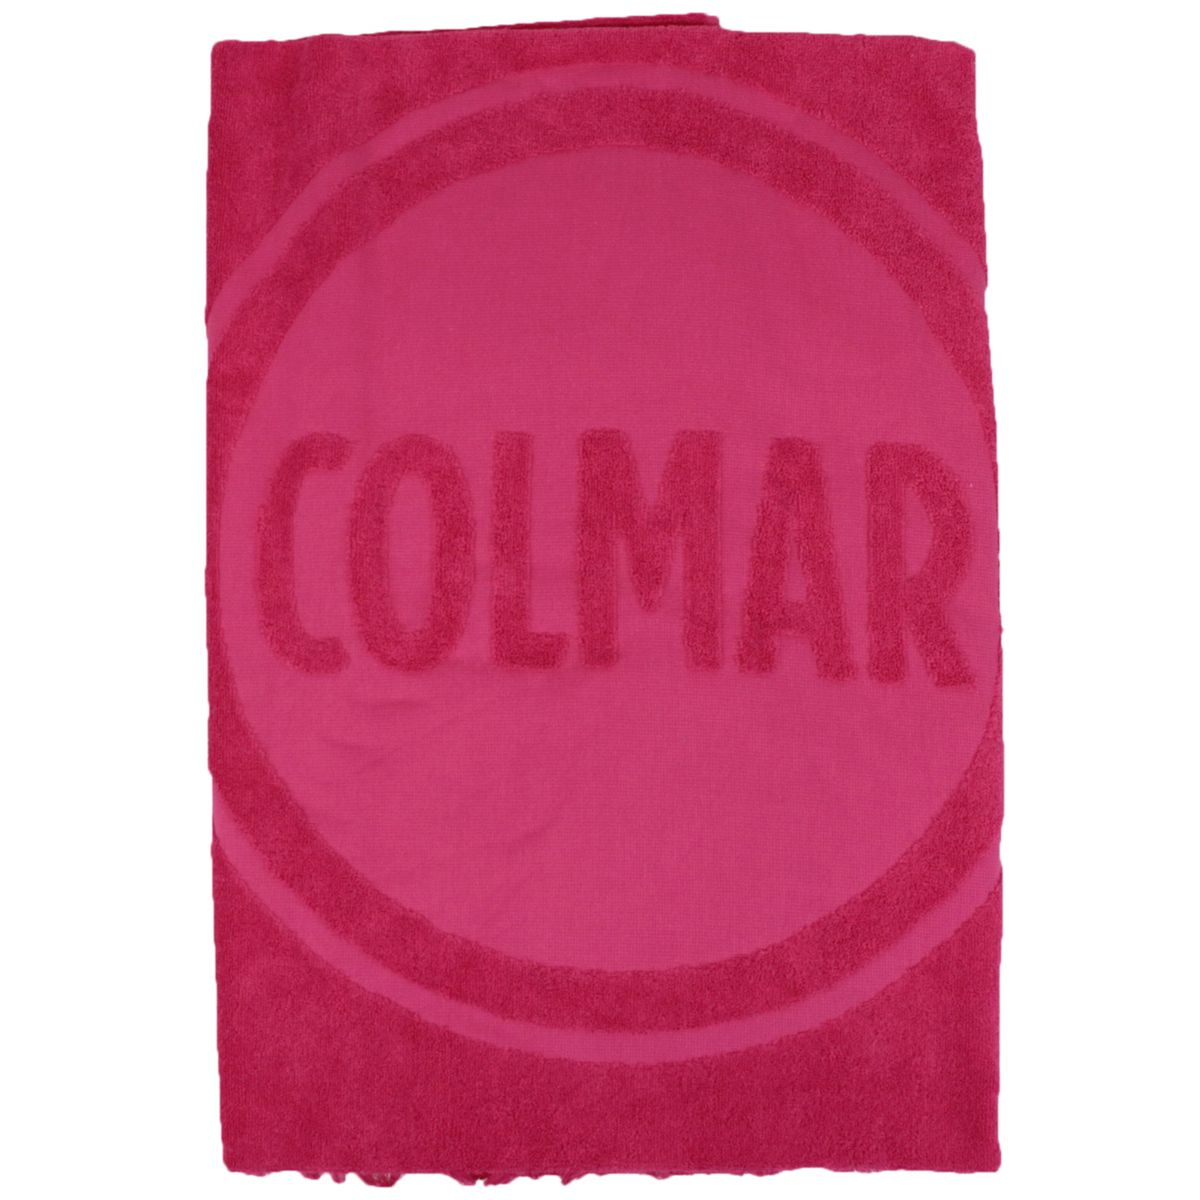 Cotton terry towel with maxi logo Fuchsia Colmar